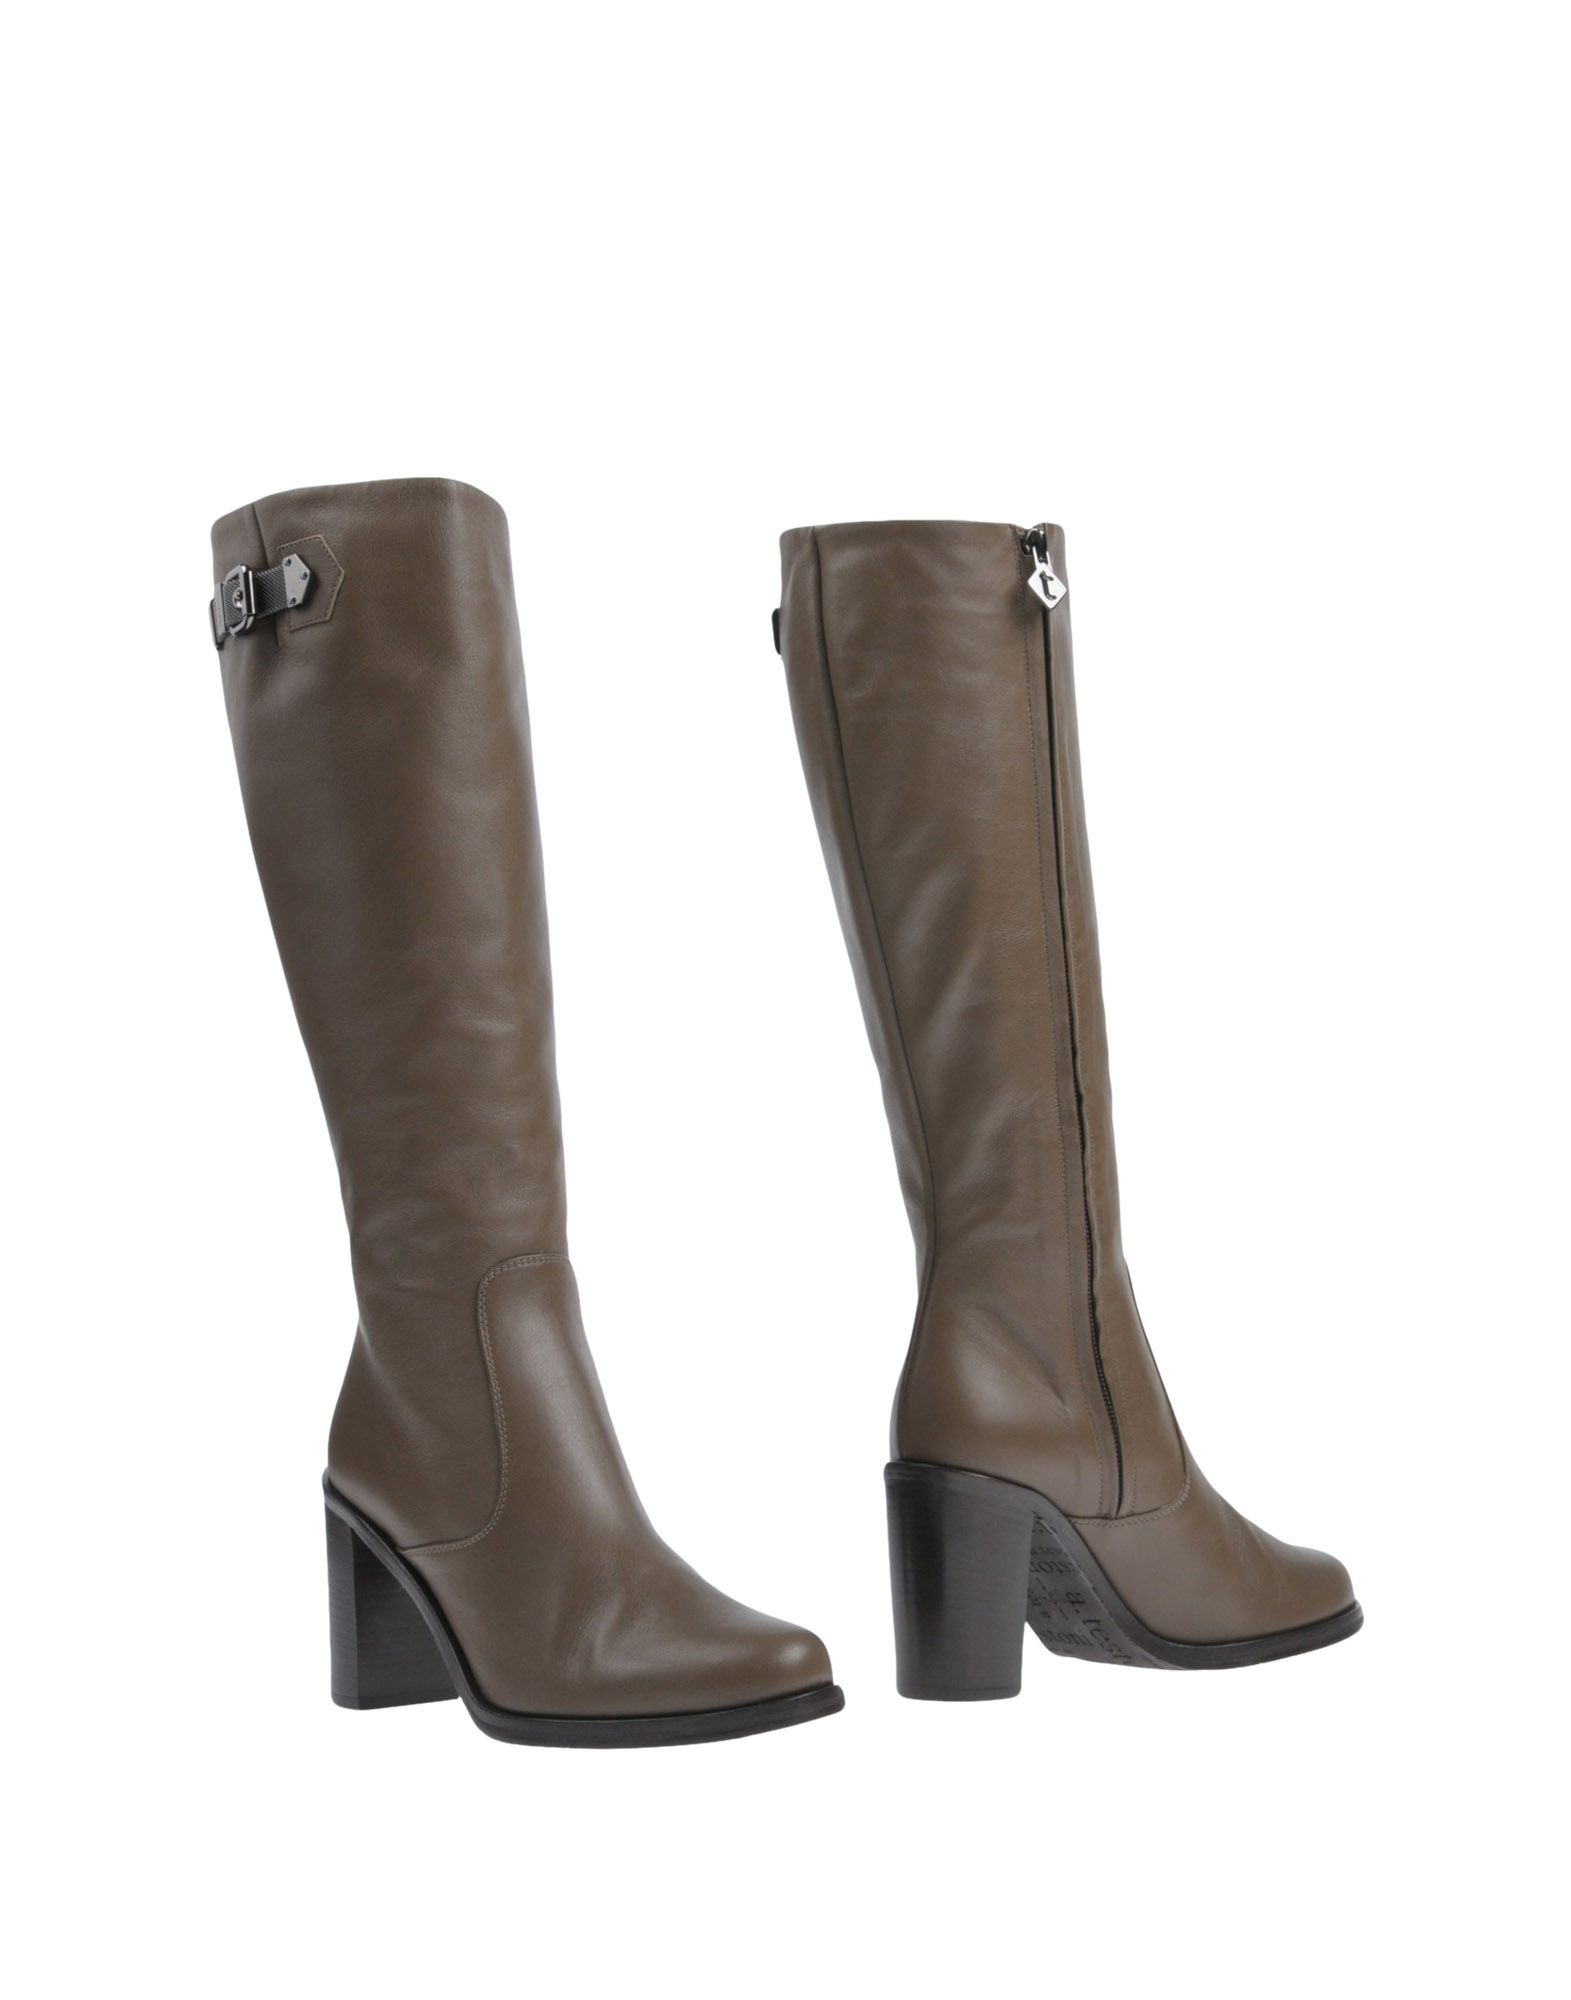 A. TESTONI Boots in Khaki